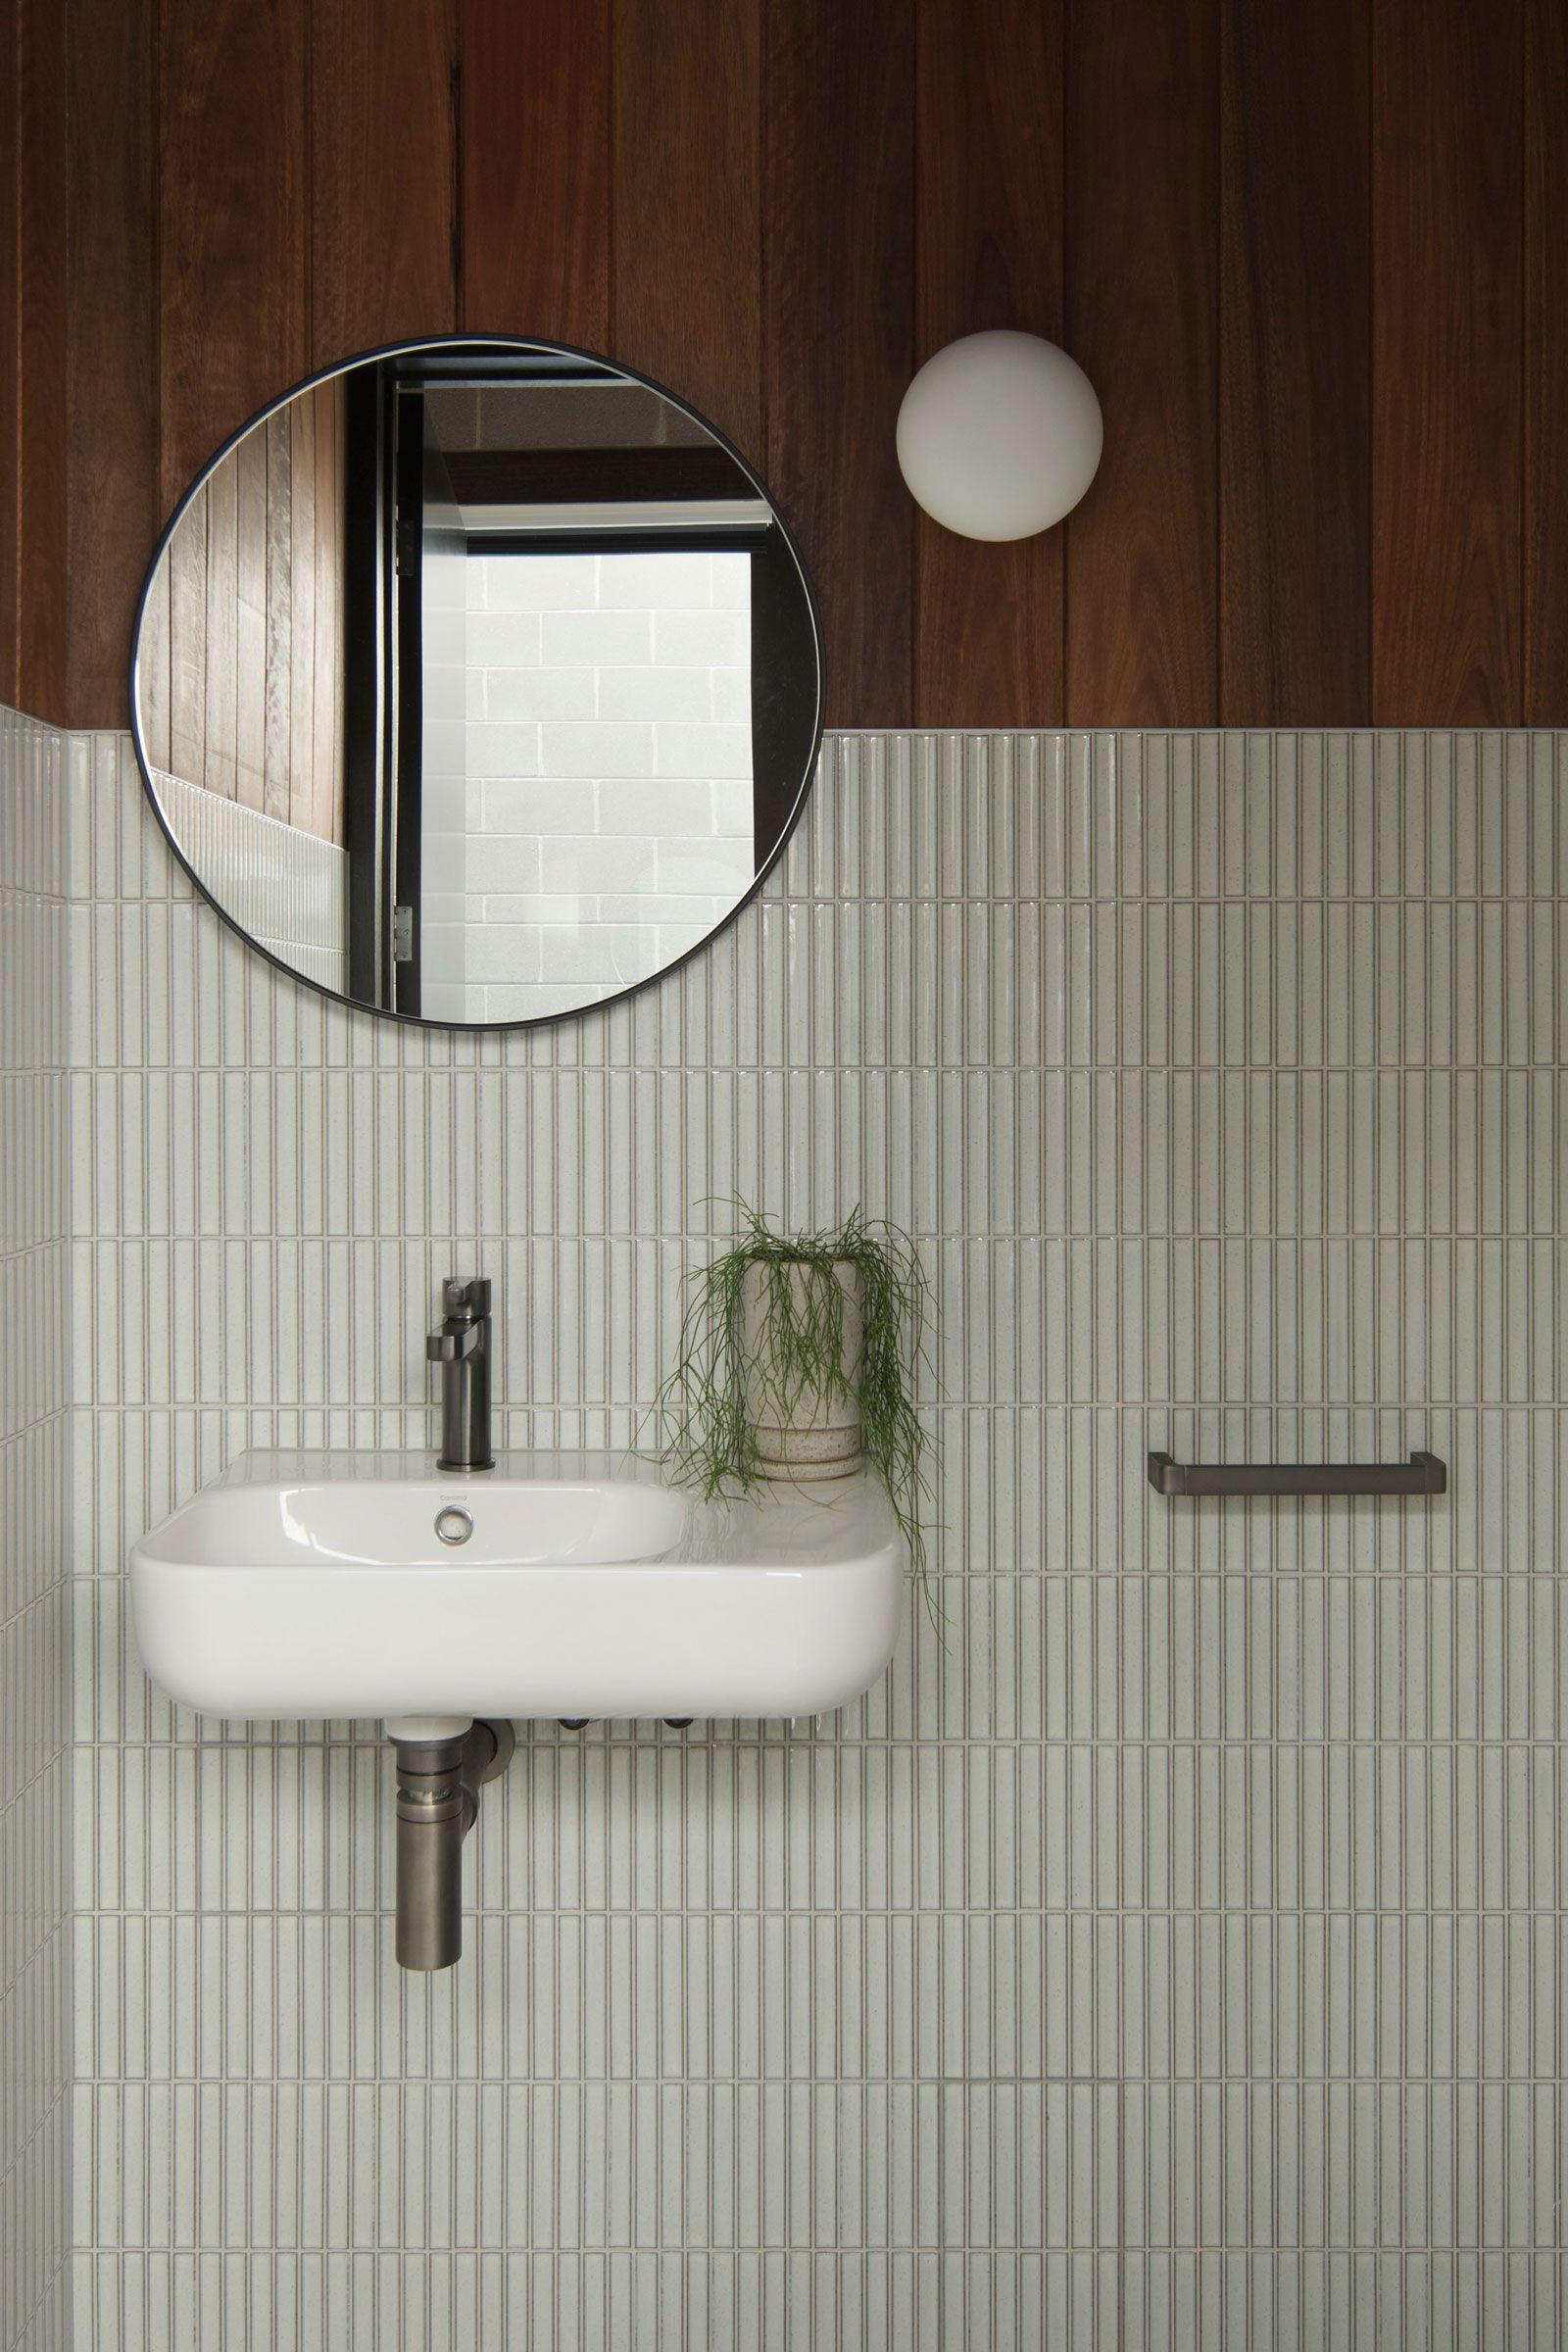 Wickham House, MODO Architecture | Strathmore, VIC, Australia